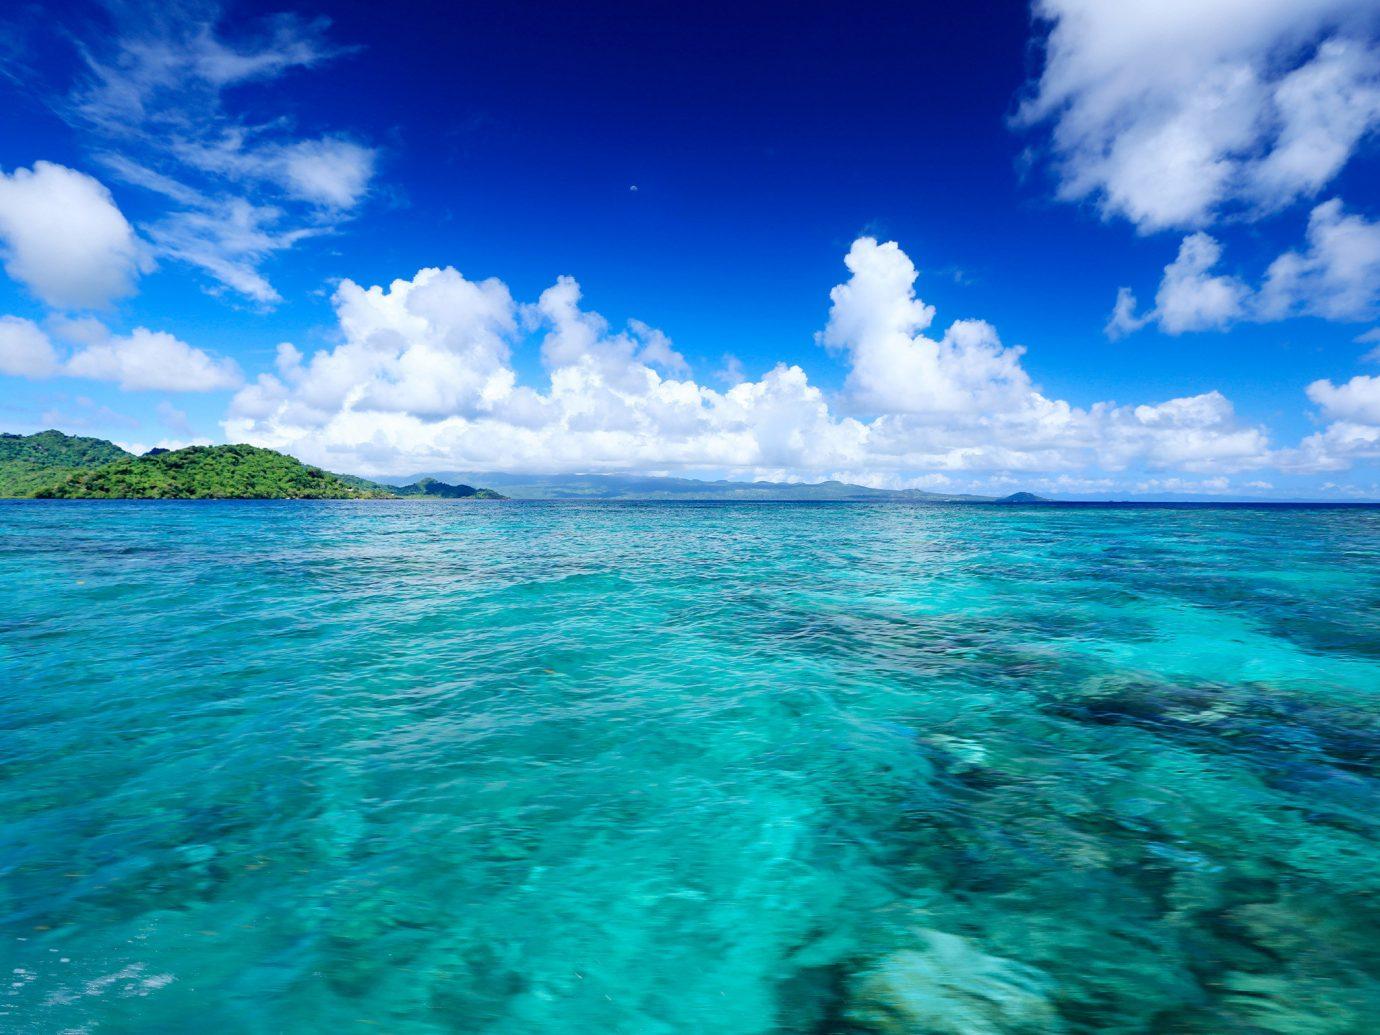 Islands Trip Ideas sky water outdoor Sea Ocean blue horizon wind wave cloud Nature Coast shore caribbean clouds Lagoon wave islet cape Island bay cloudy reef day